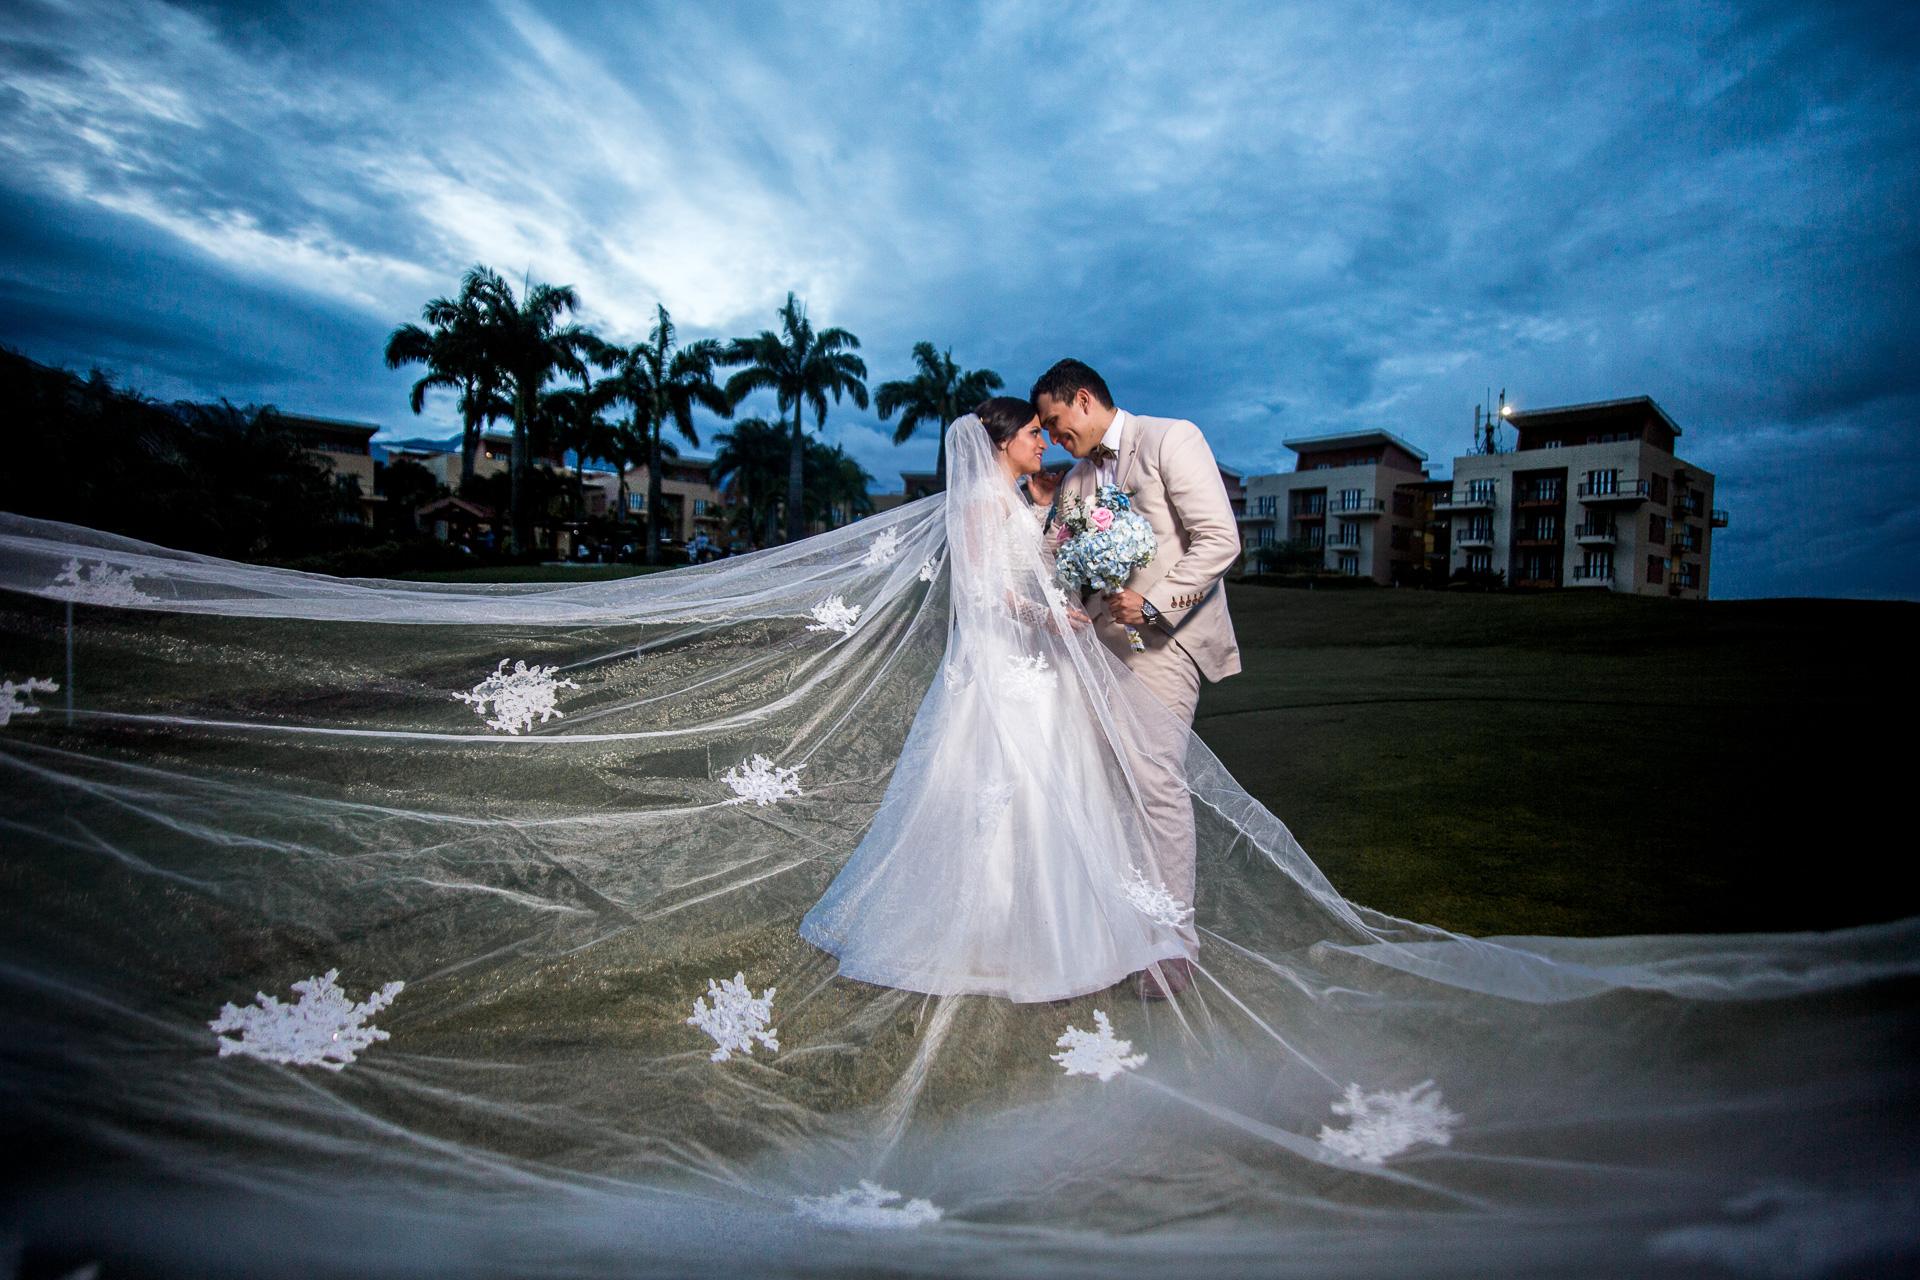 Fotógrafos-de-bodas-en-Colombia-Sthephanie-y-David-39 STEPHANIE + DAVID